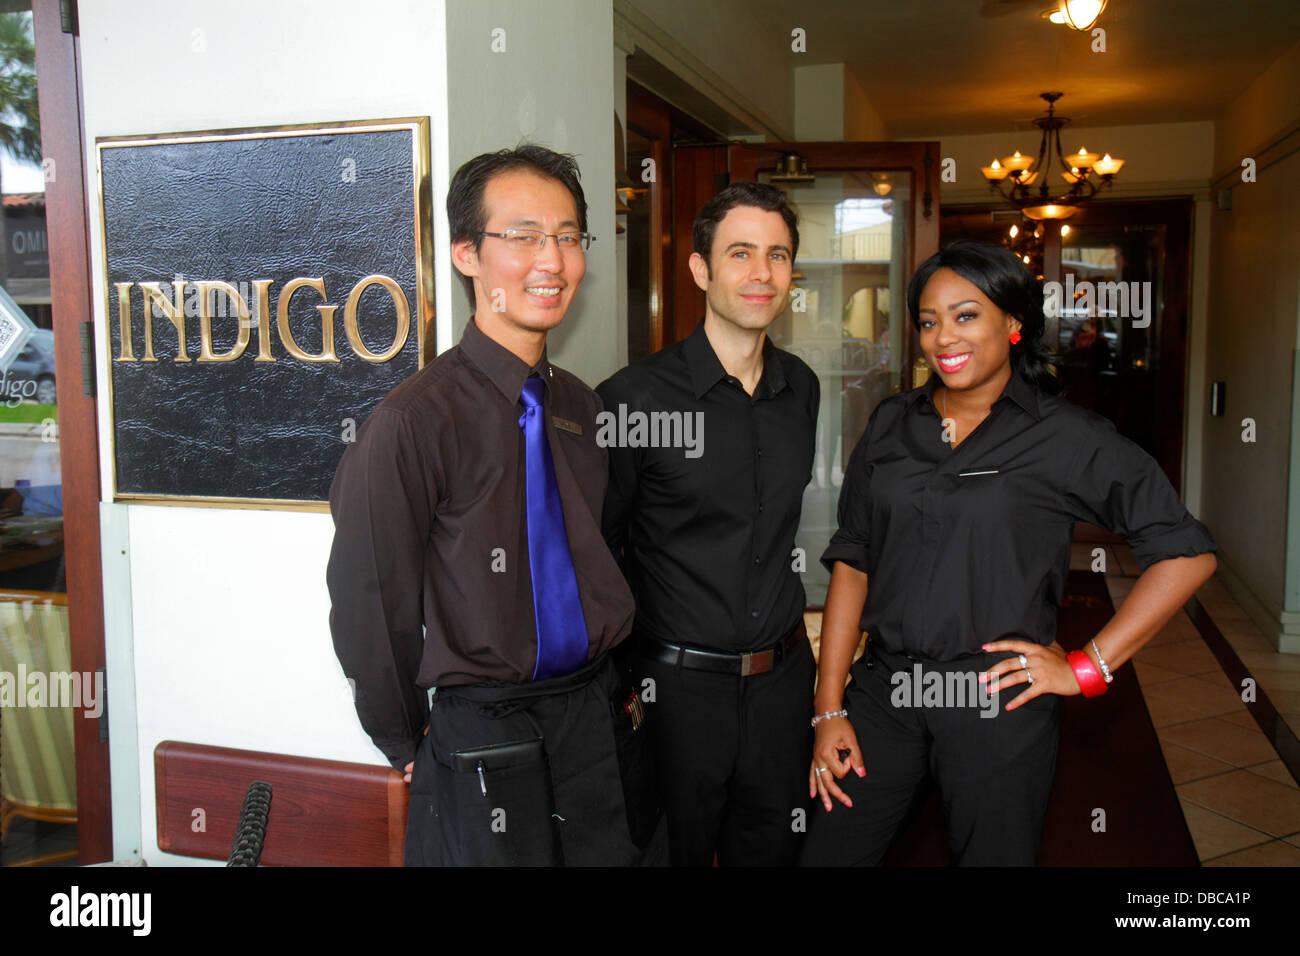 Fort Lauderdale Ft. Florida Las Olas Boulevard businesses shopping Riverside Hotel Indigo restaurant waiter host - Stock Image